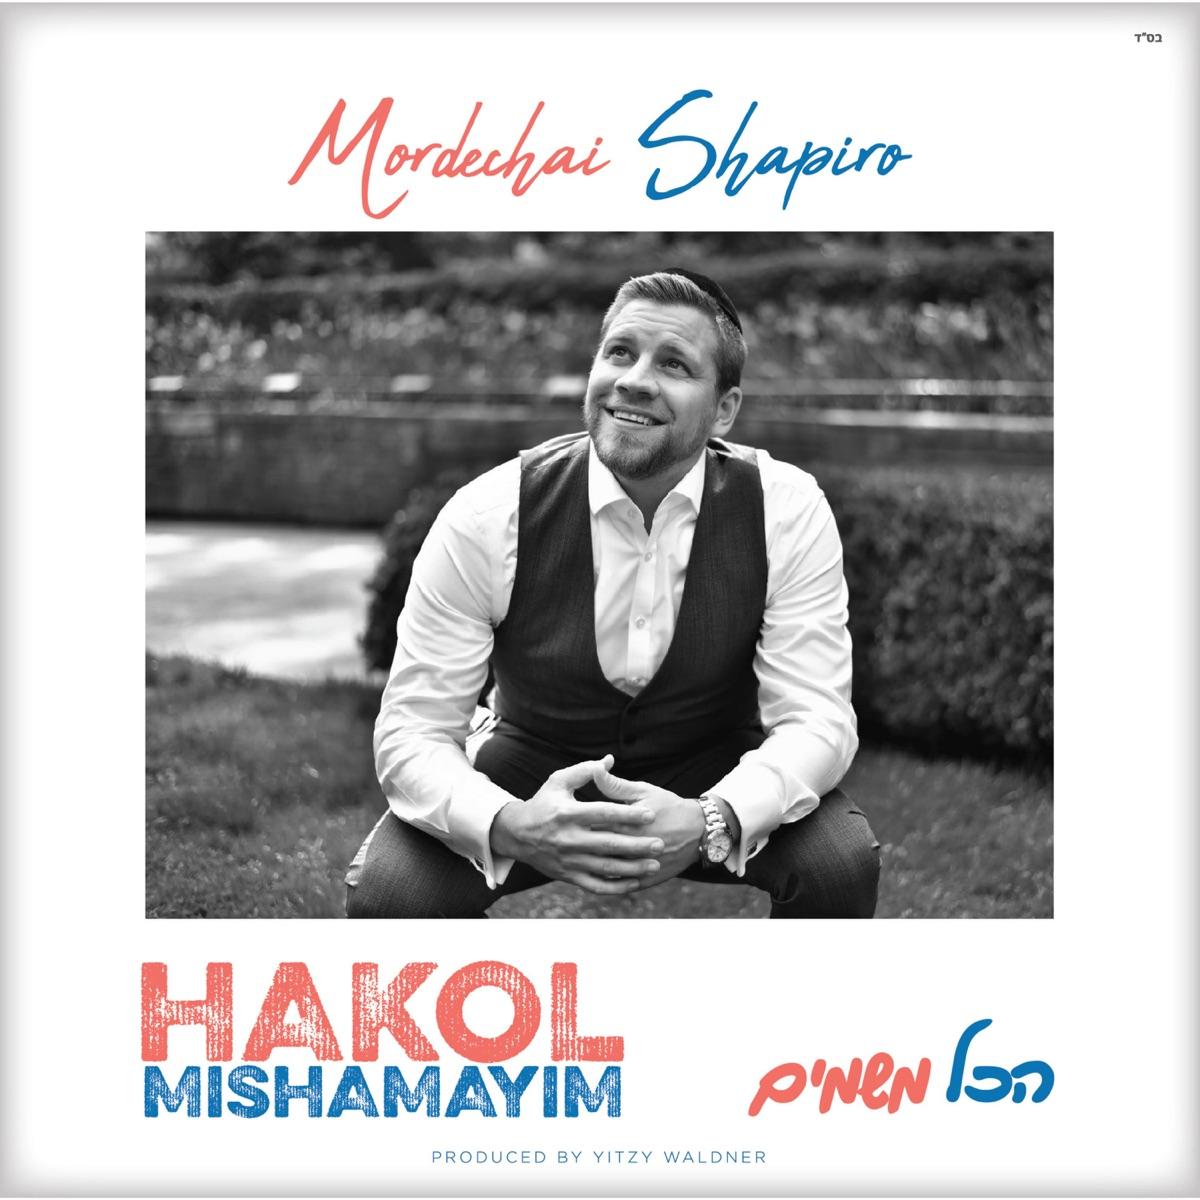 Hakol Mishamayim Mordechai Shapiro CD cover